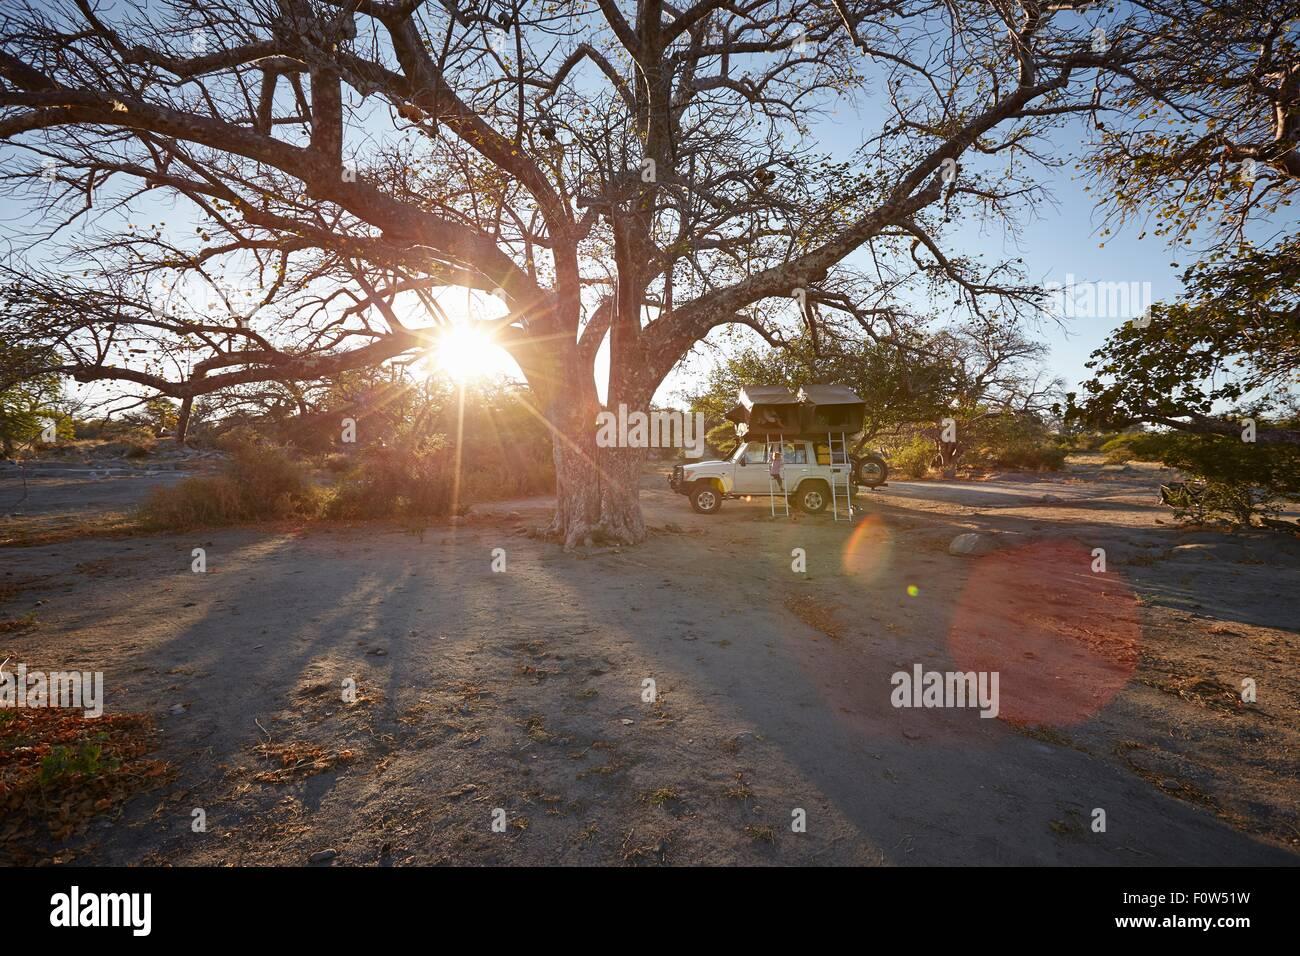 Off road vehicle parked by large tree, sunset, Gweta, makgadikgadi, Botswana - Stock Image